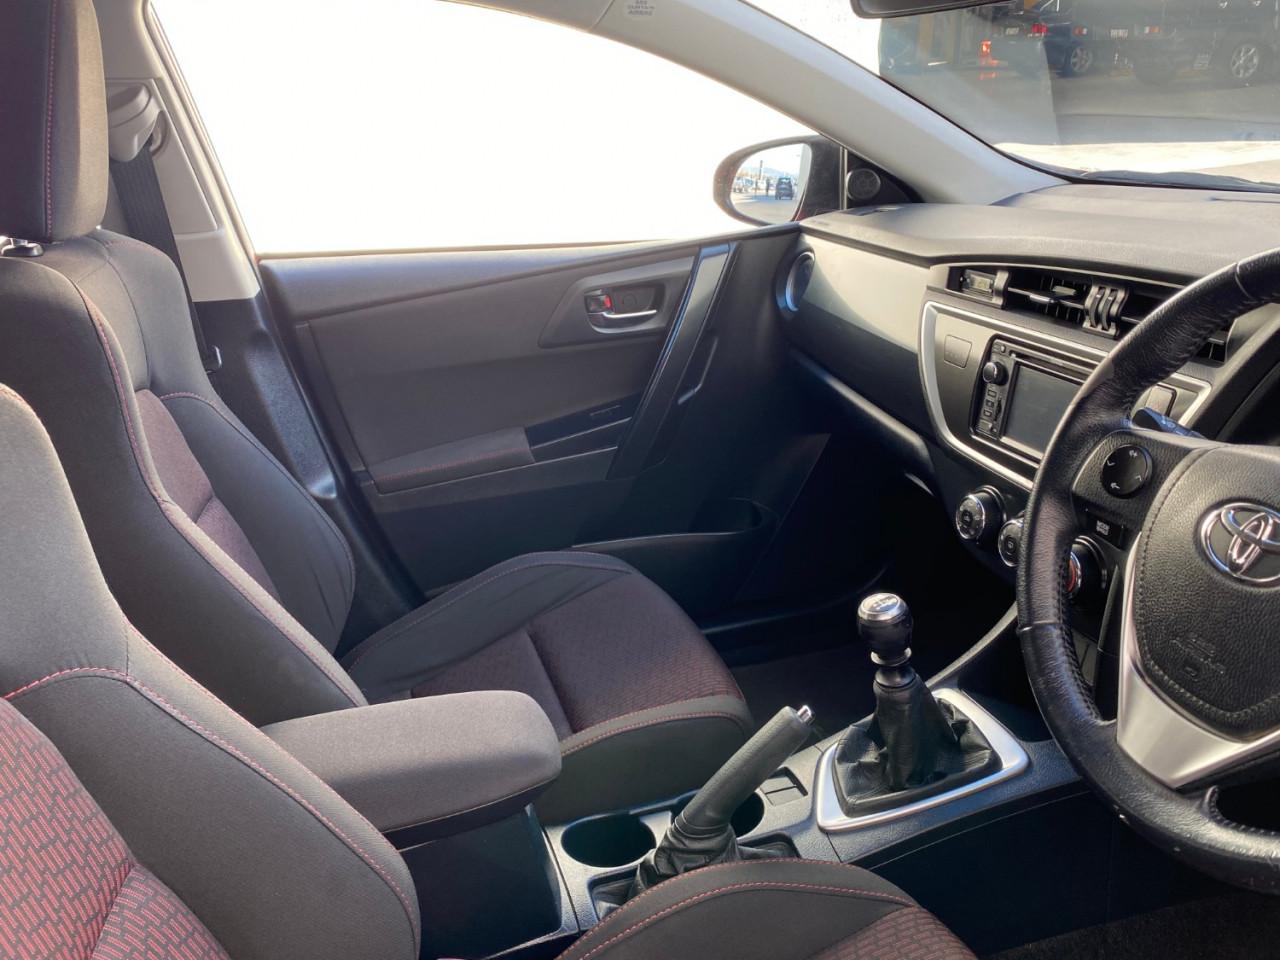 2013 Toyota Corolla ZRE182R LEVIN Hatchback